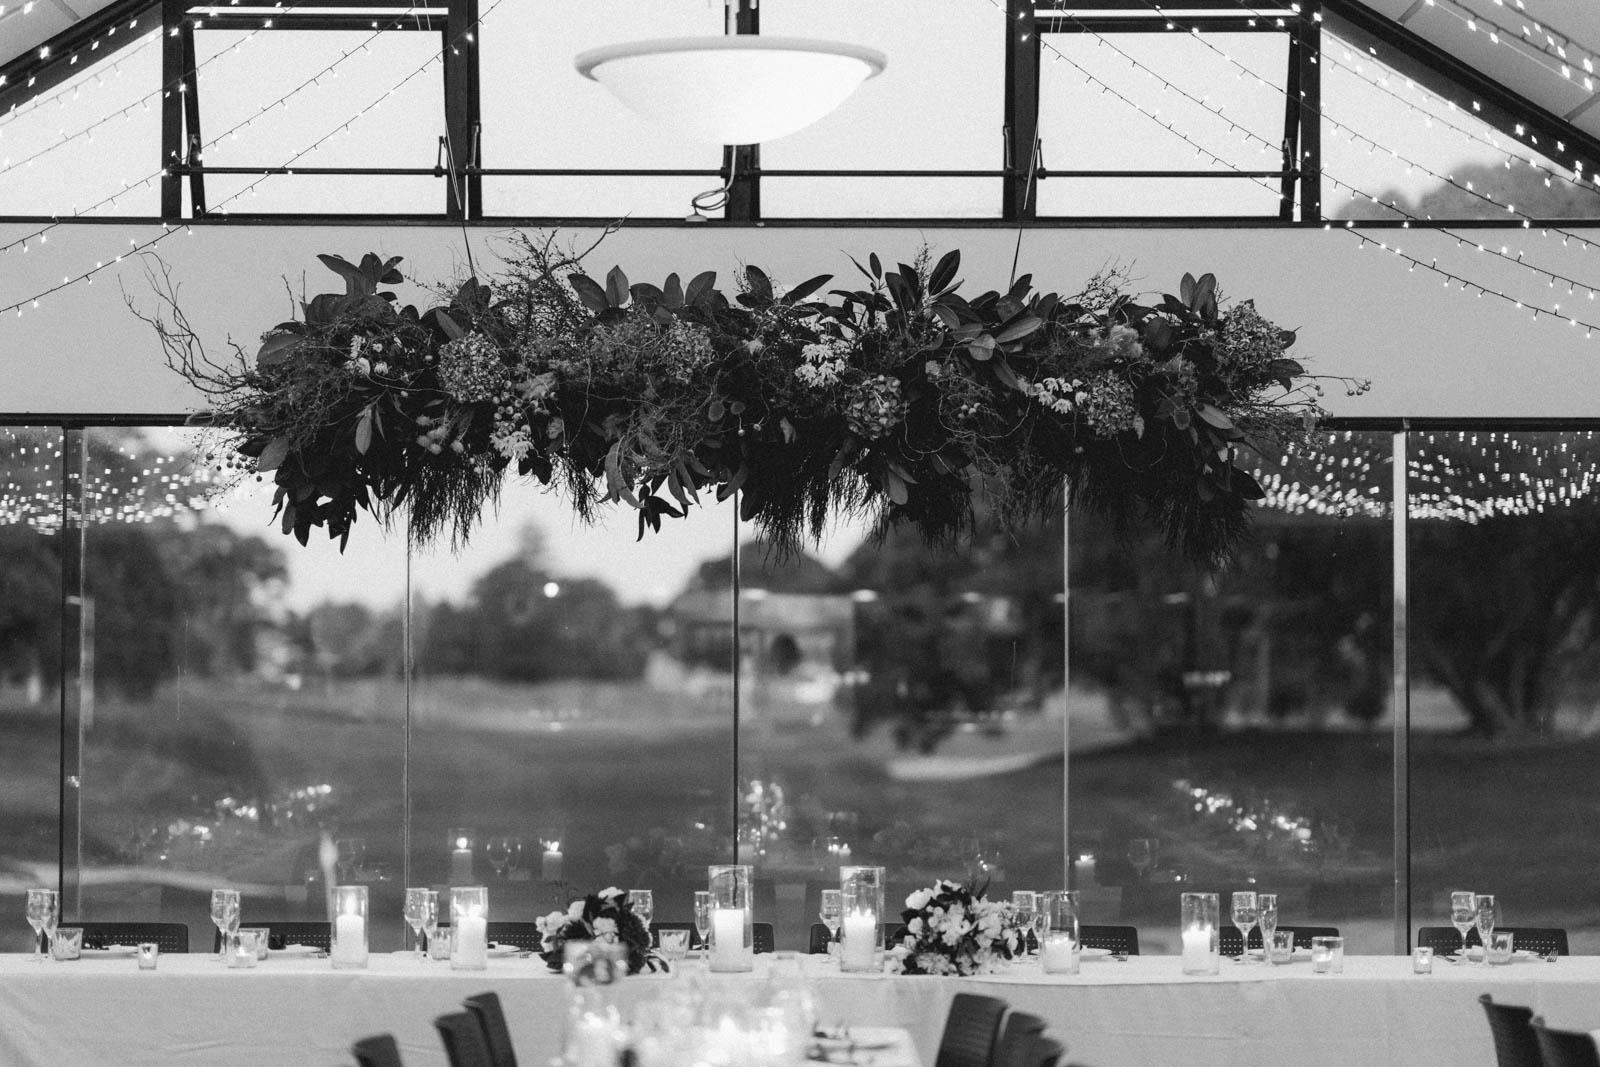 newfound-s-p-mt-maunganui-tauranga-wedding-photographer-1838-A9_08040